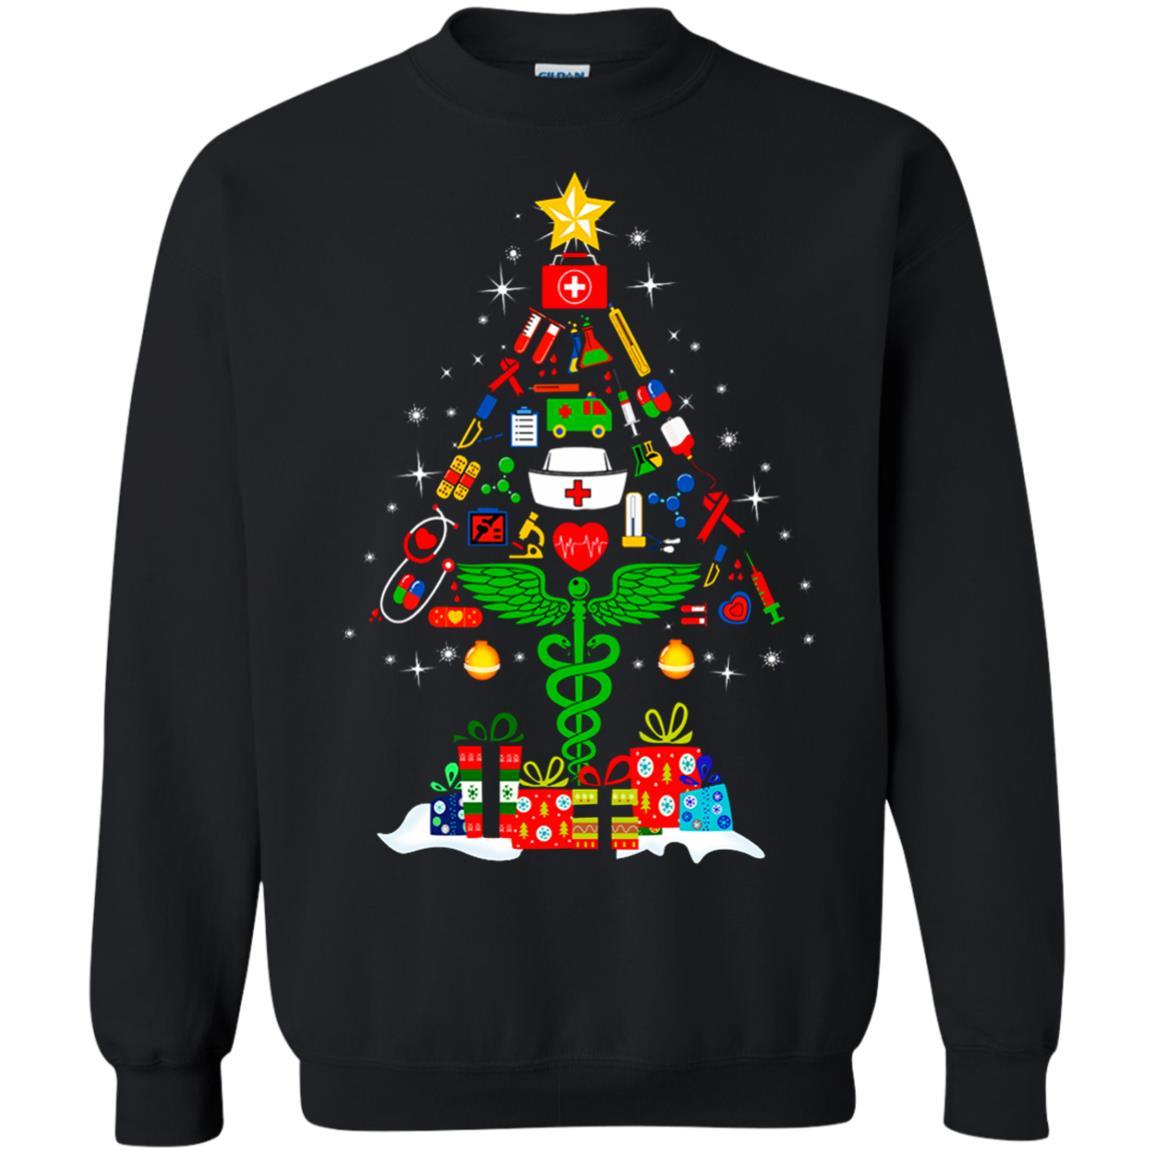 image 95 - Nurse Christmas Tree sweater, hoodie, long sleeve